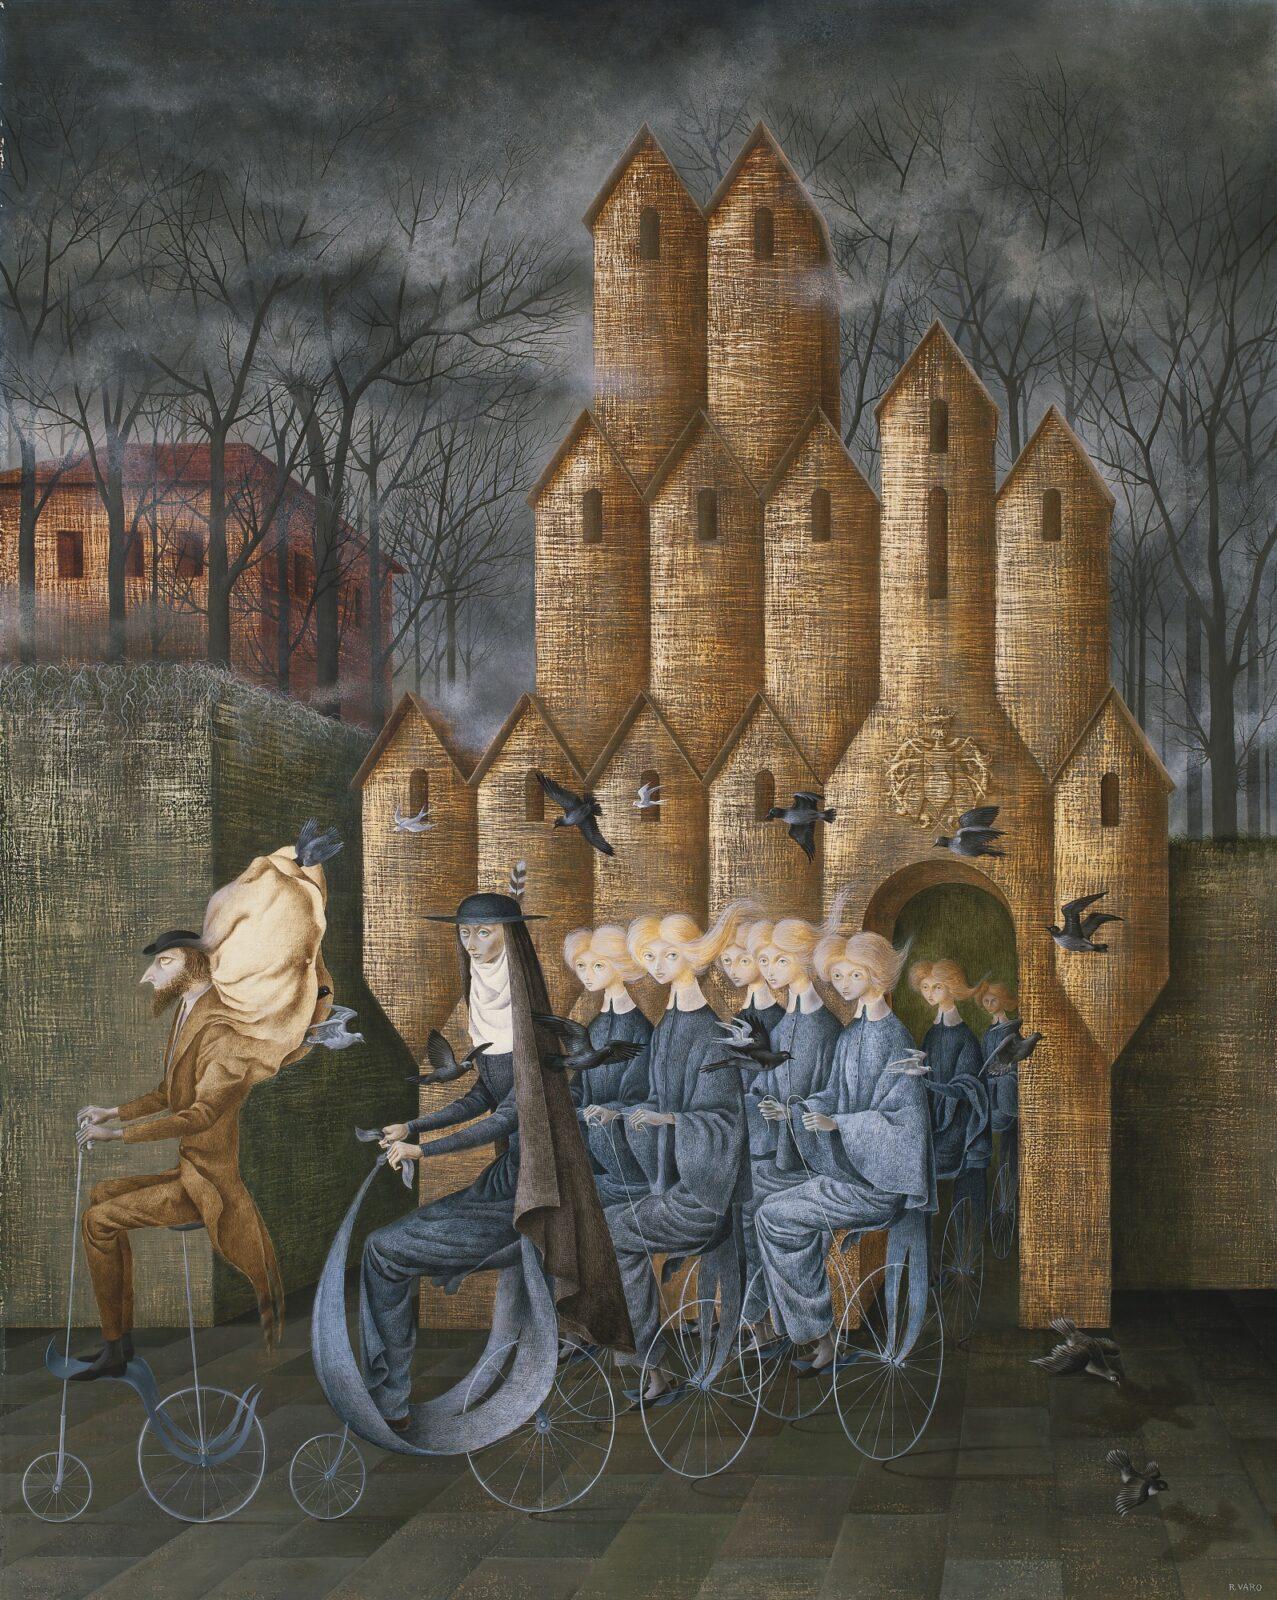 The mystical scene by Spanish surrealist Remedios Varo set a world record